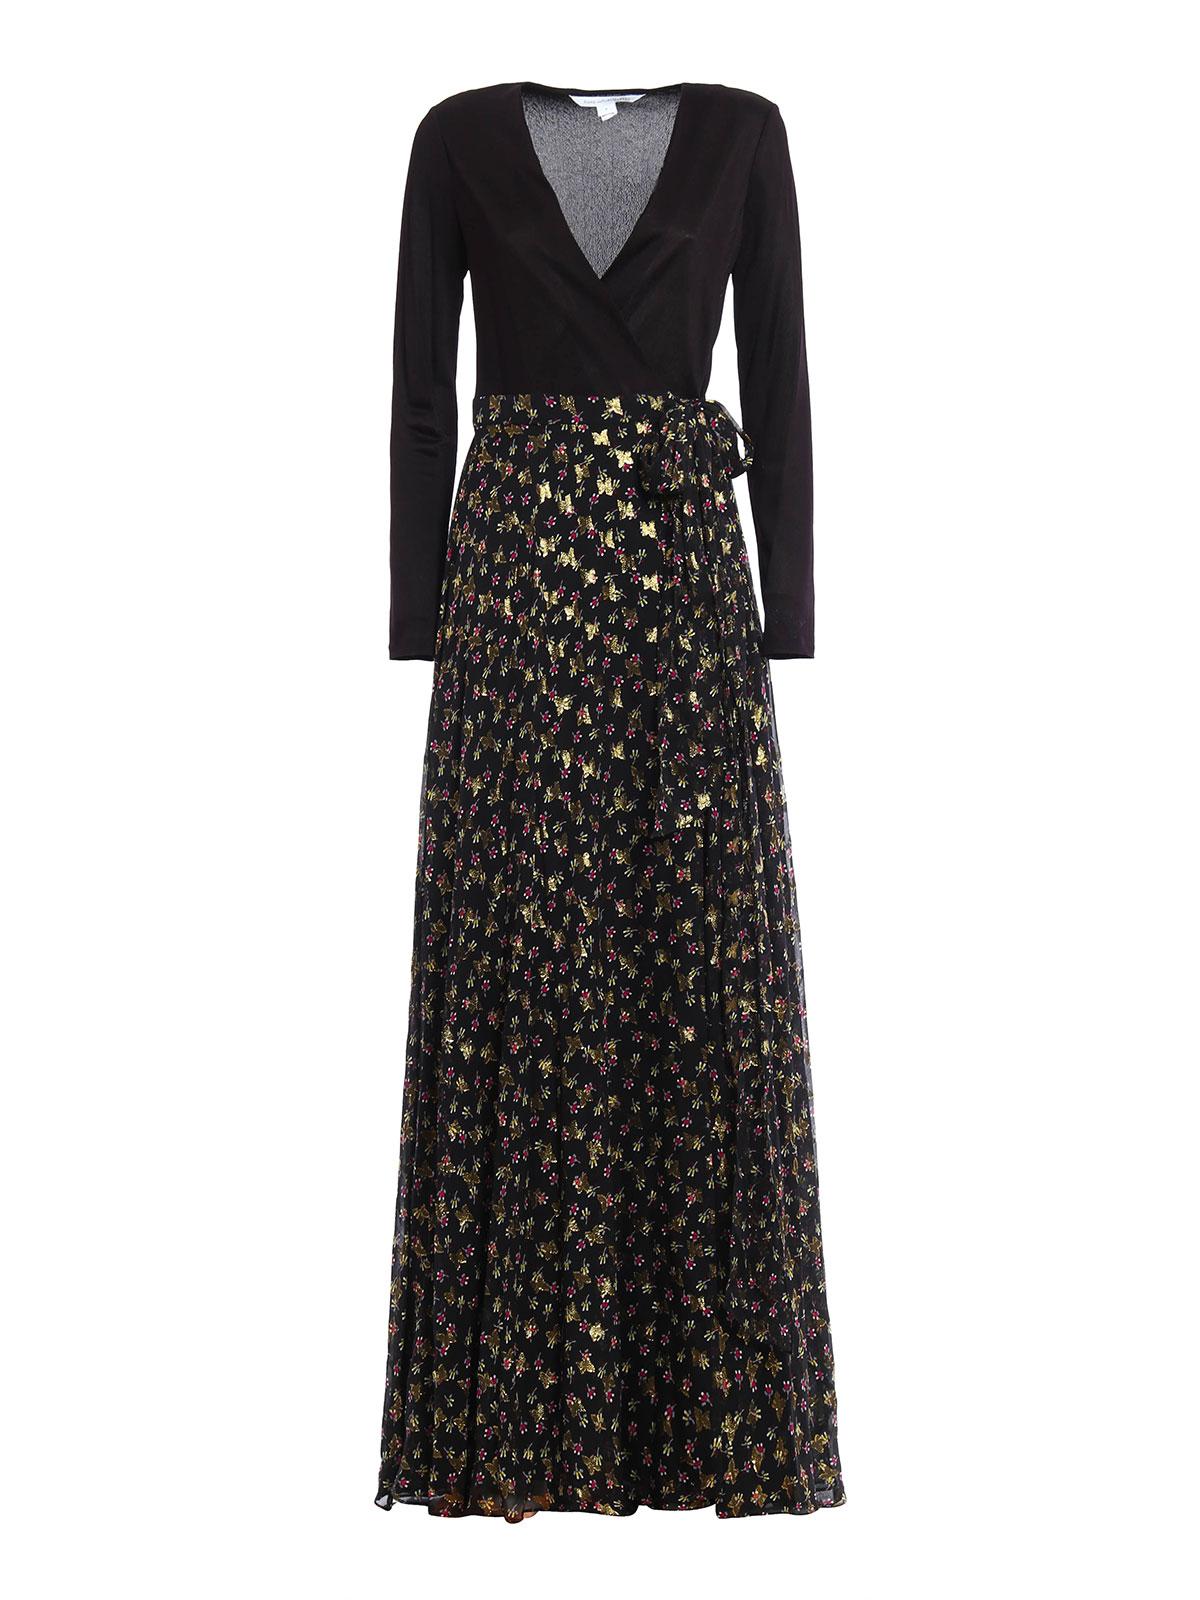 Aviva long dress by Diane Von Furstenberg - evening dresses  iKRIX